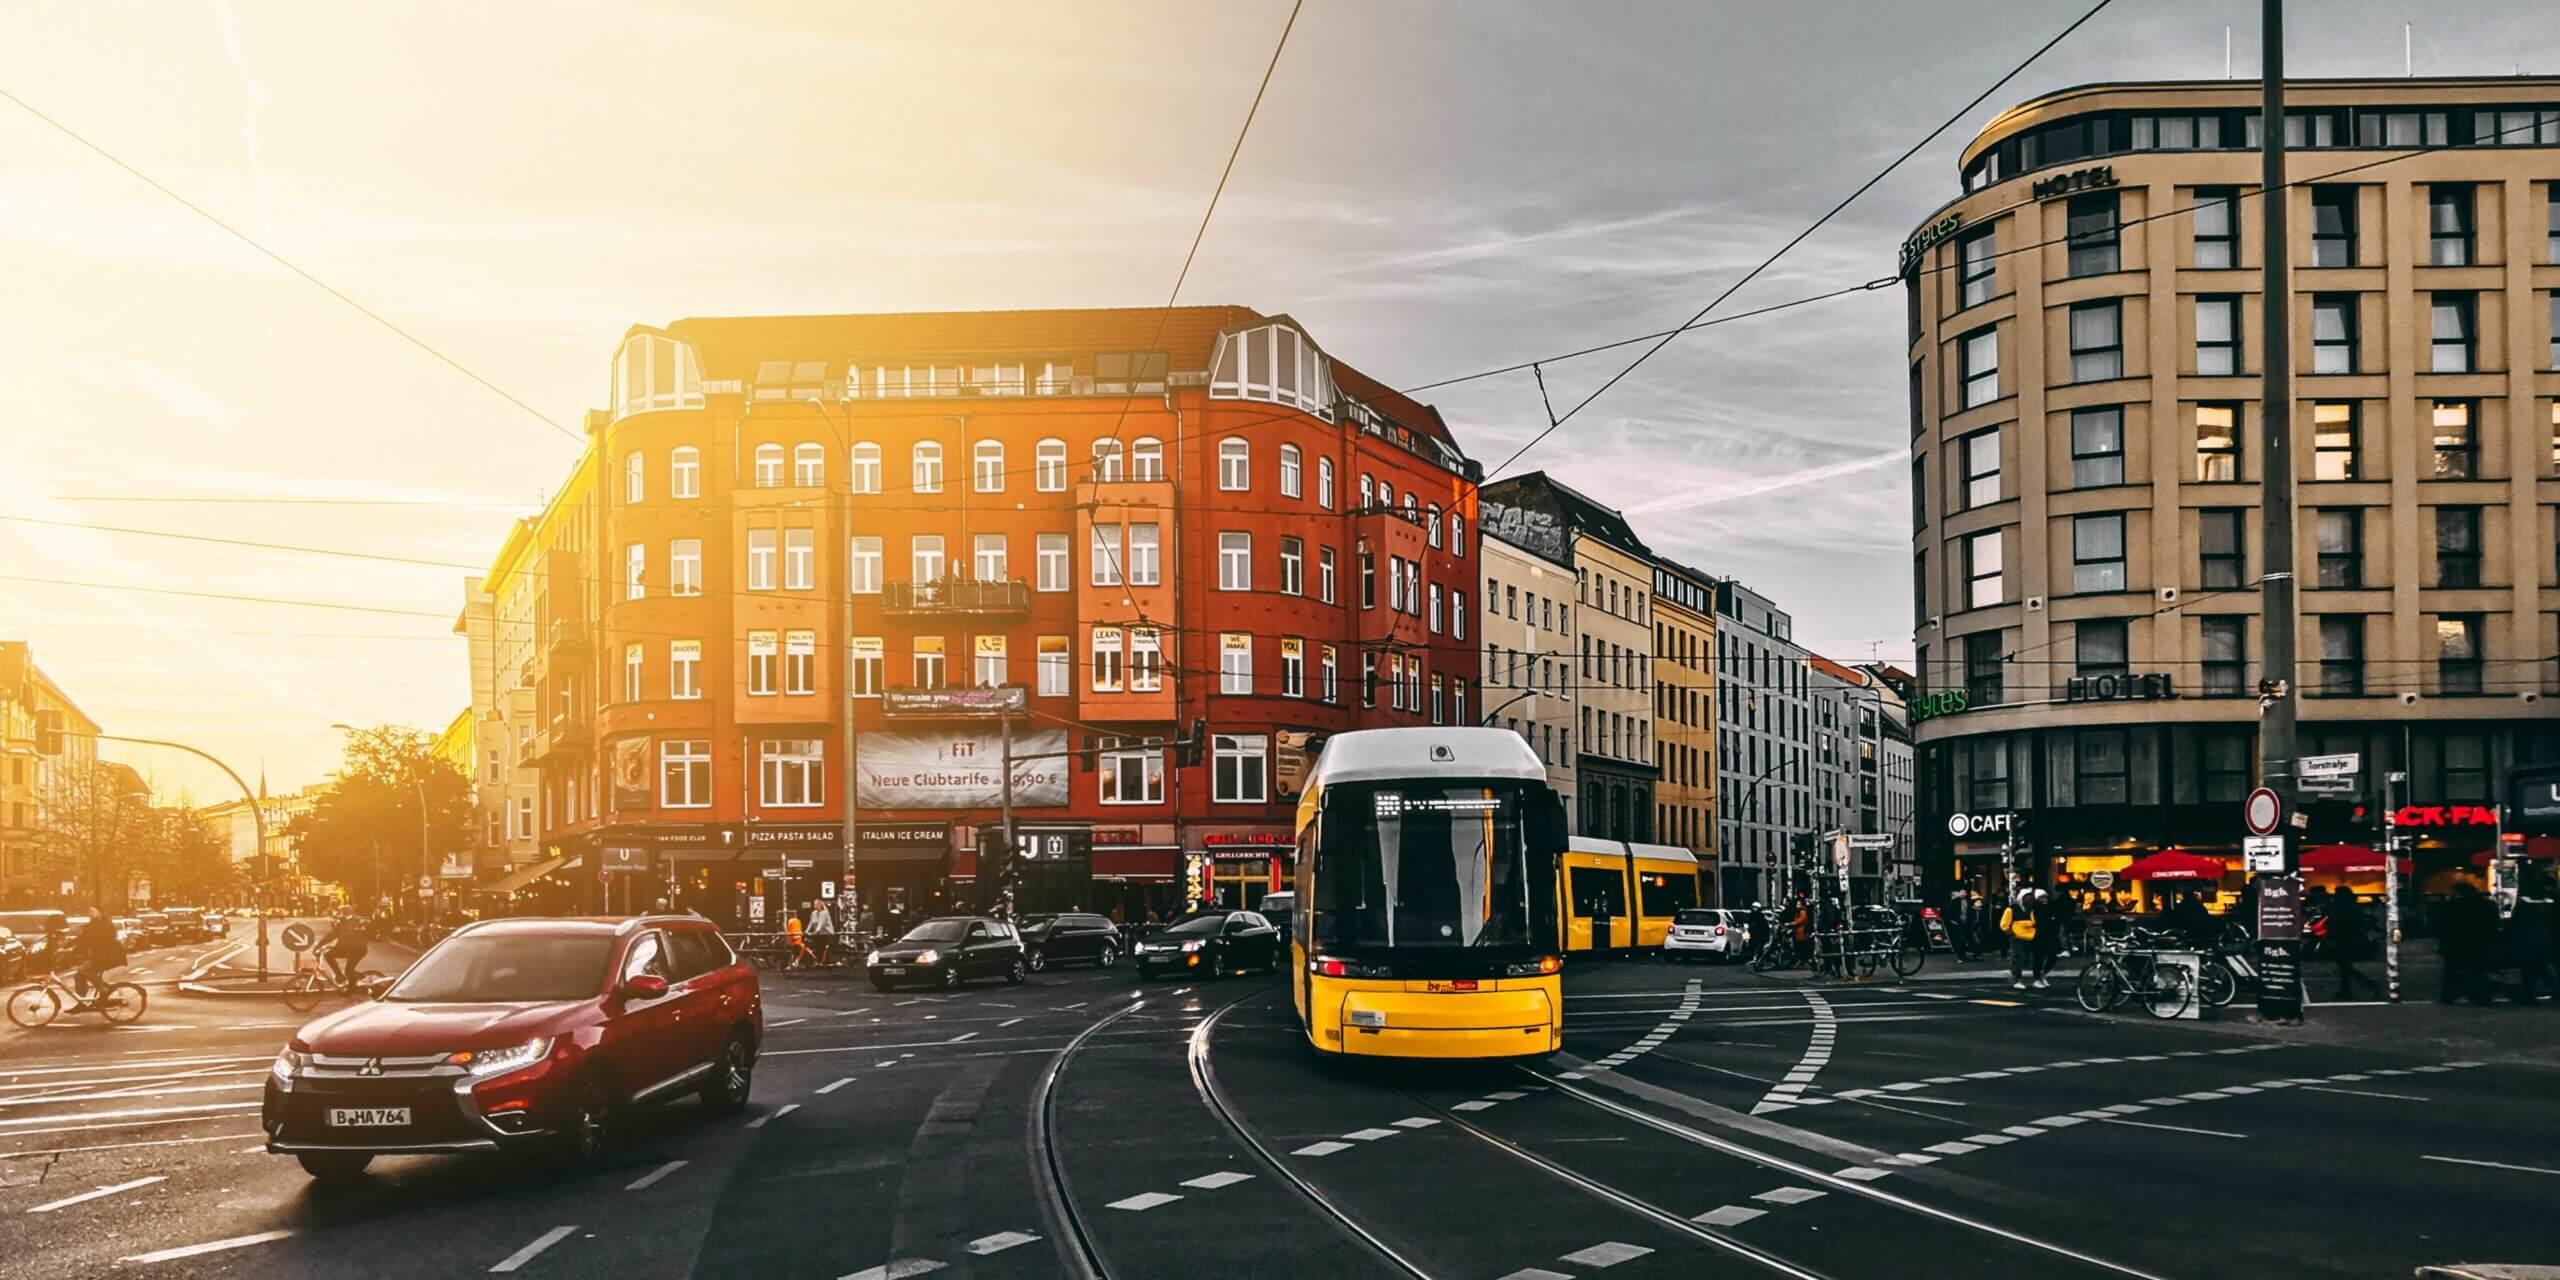 Germany ALPR Austria Umlaut License Plate Recognition street monitoring buses